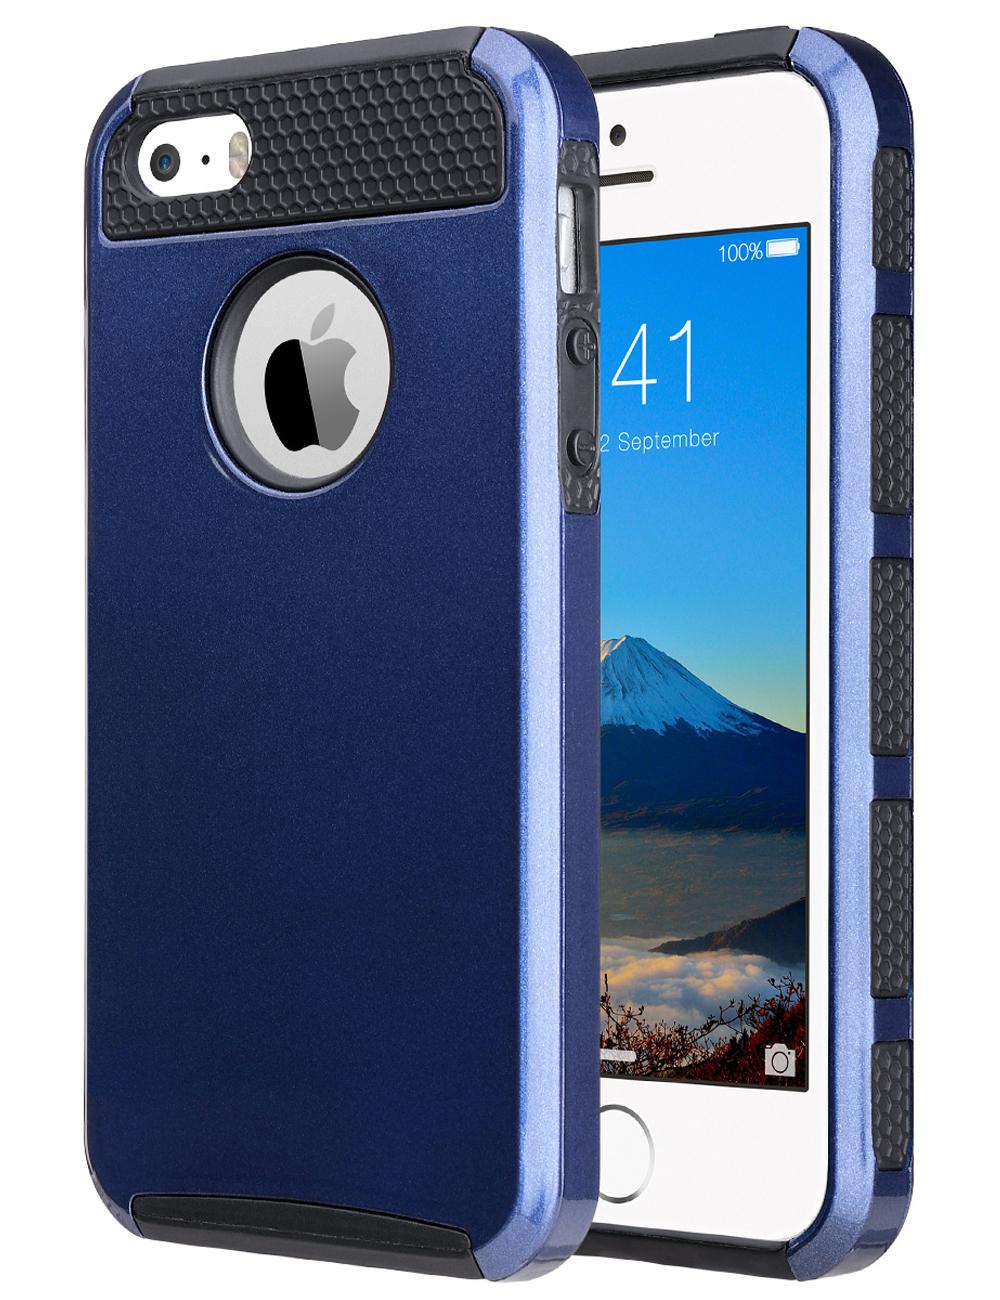 shockproof rugged hybrid rubber hard cover case for iphone 5s 5 se